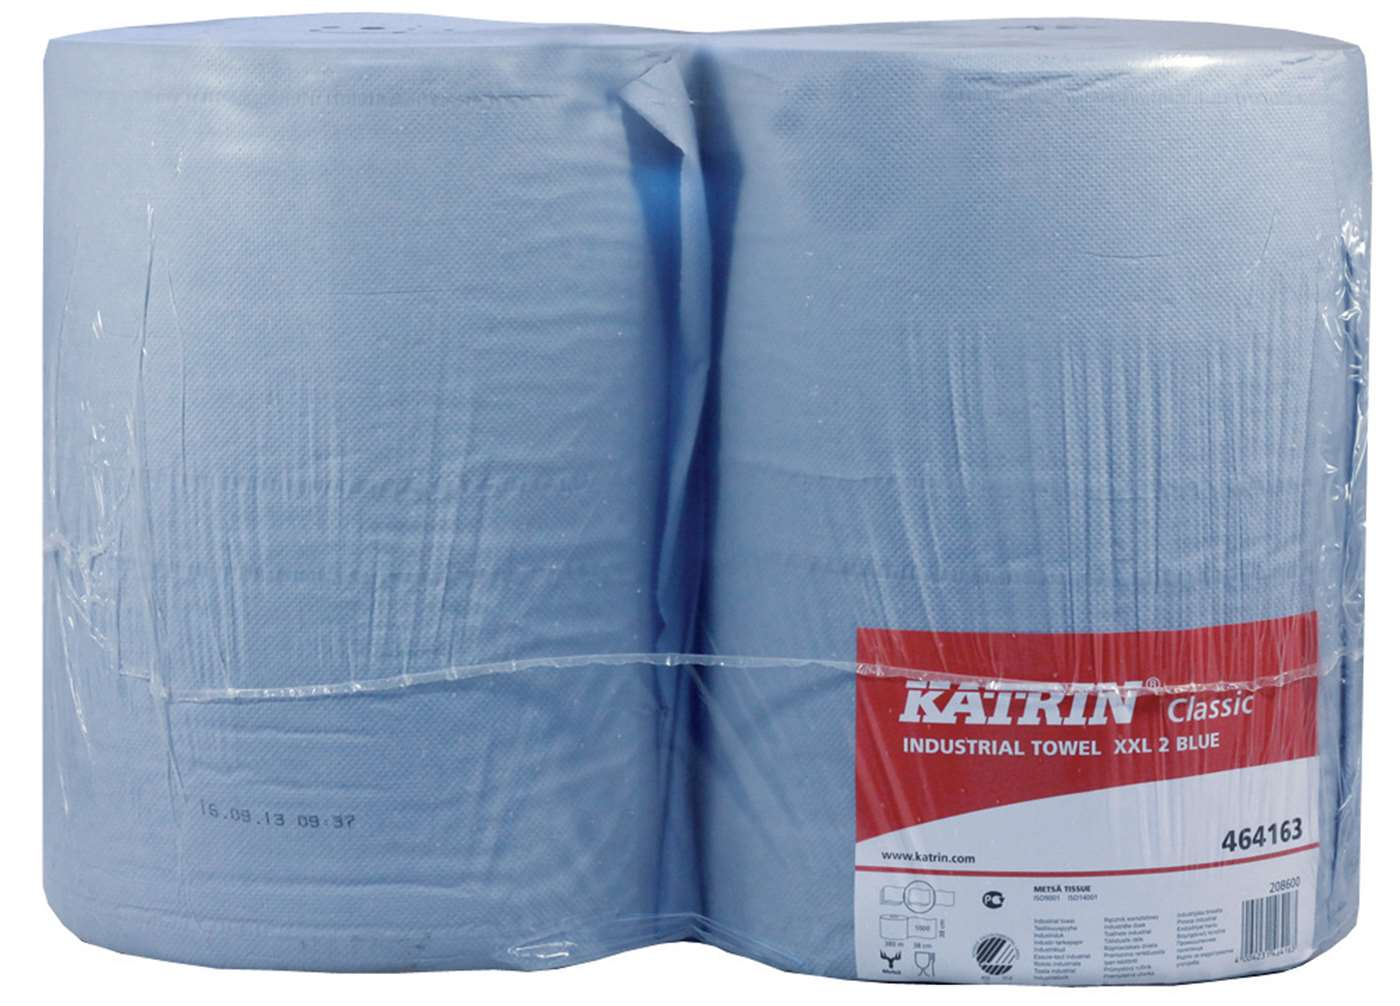 Katrin Classic XXL2 Blue Industrial Wiping Roll 464163